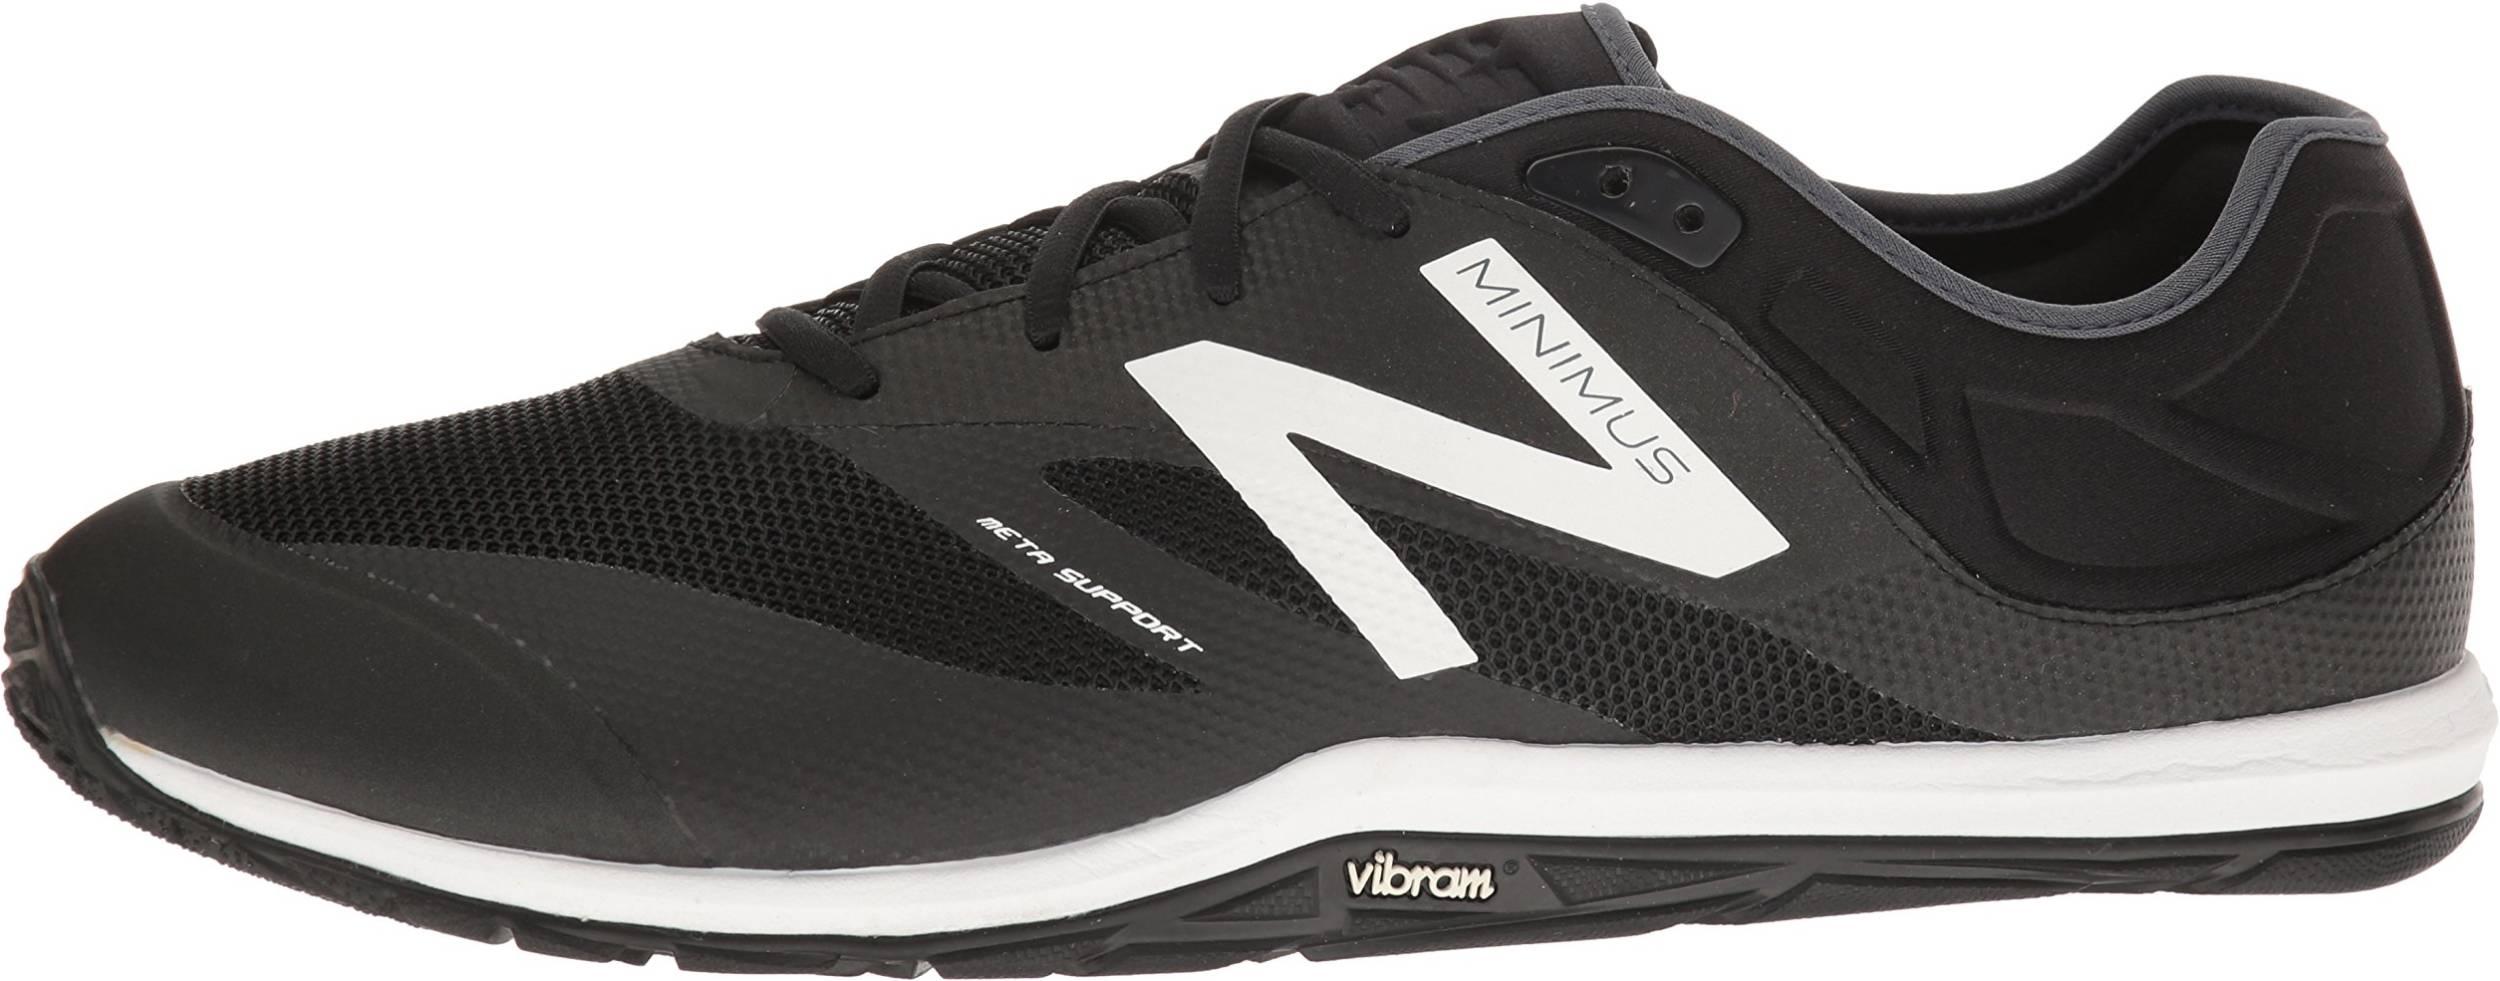 New Balance Minimus 20v6 Trainer